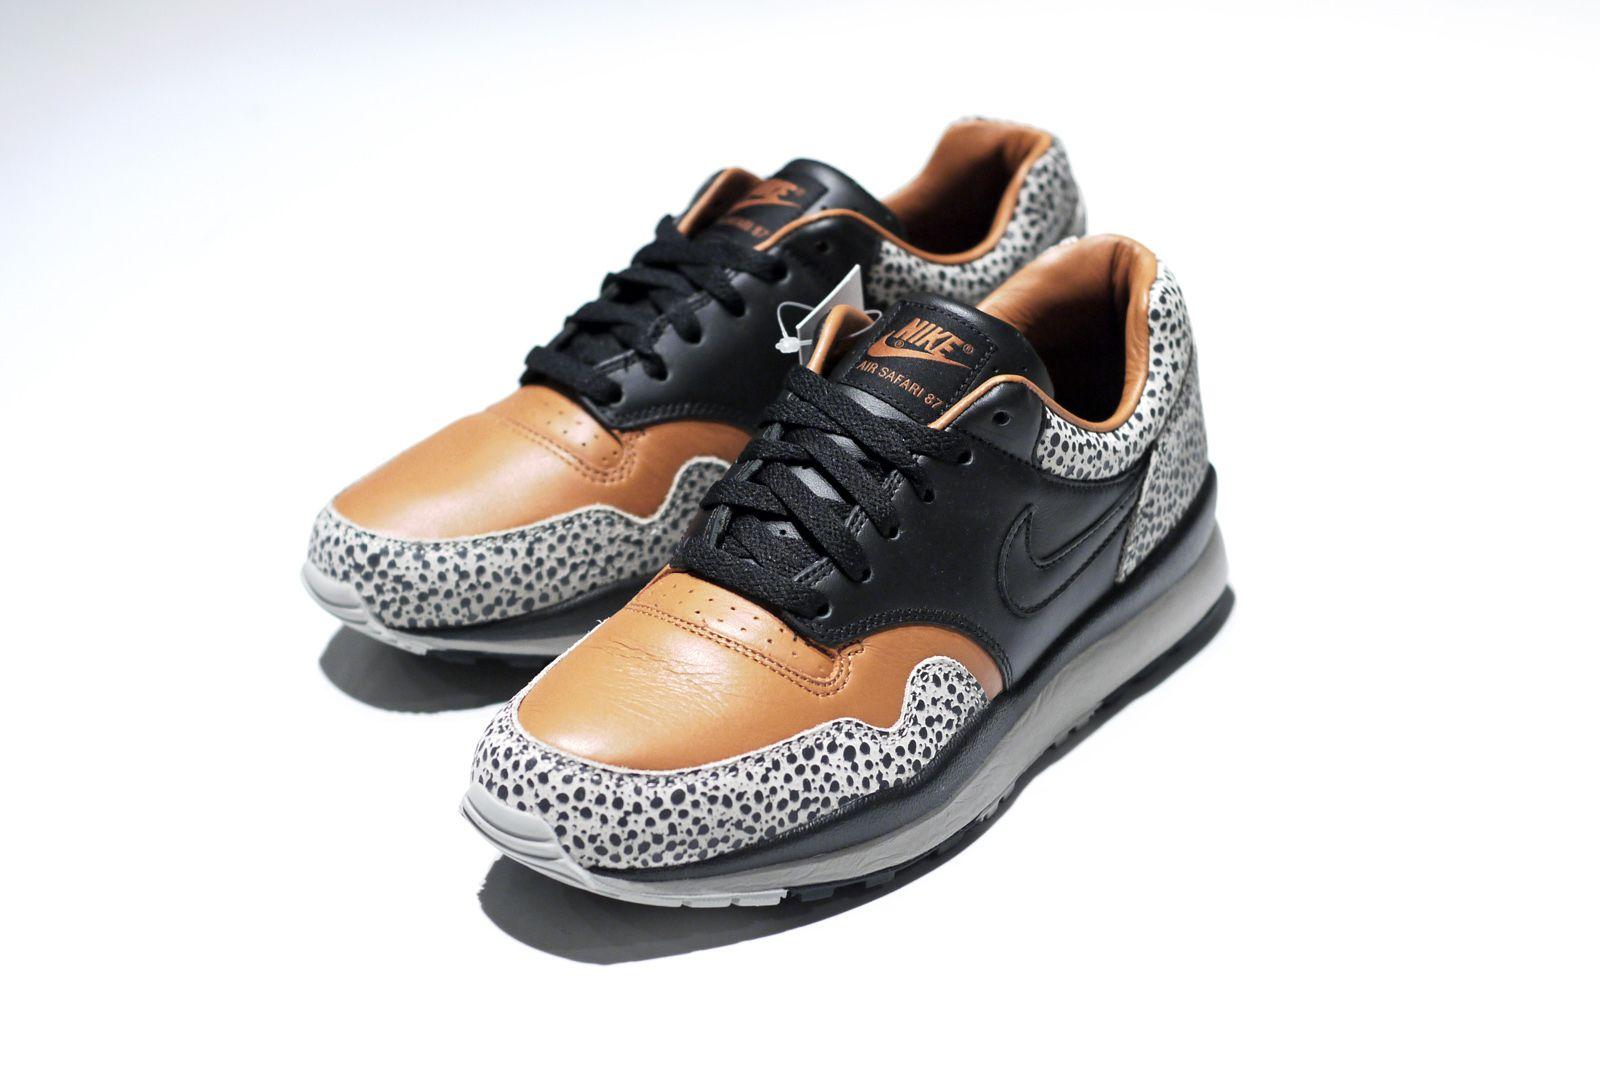 best sneakers 797a3 012a1 Nike Air Max 87 Safari Pack